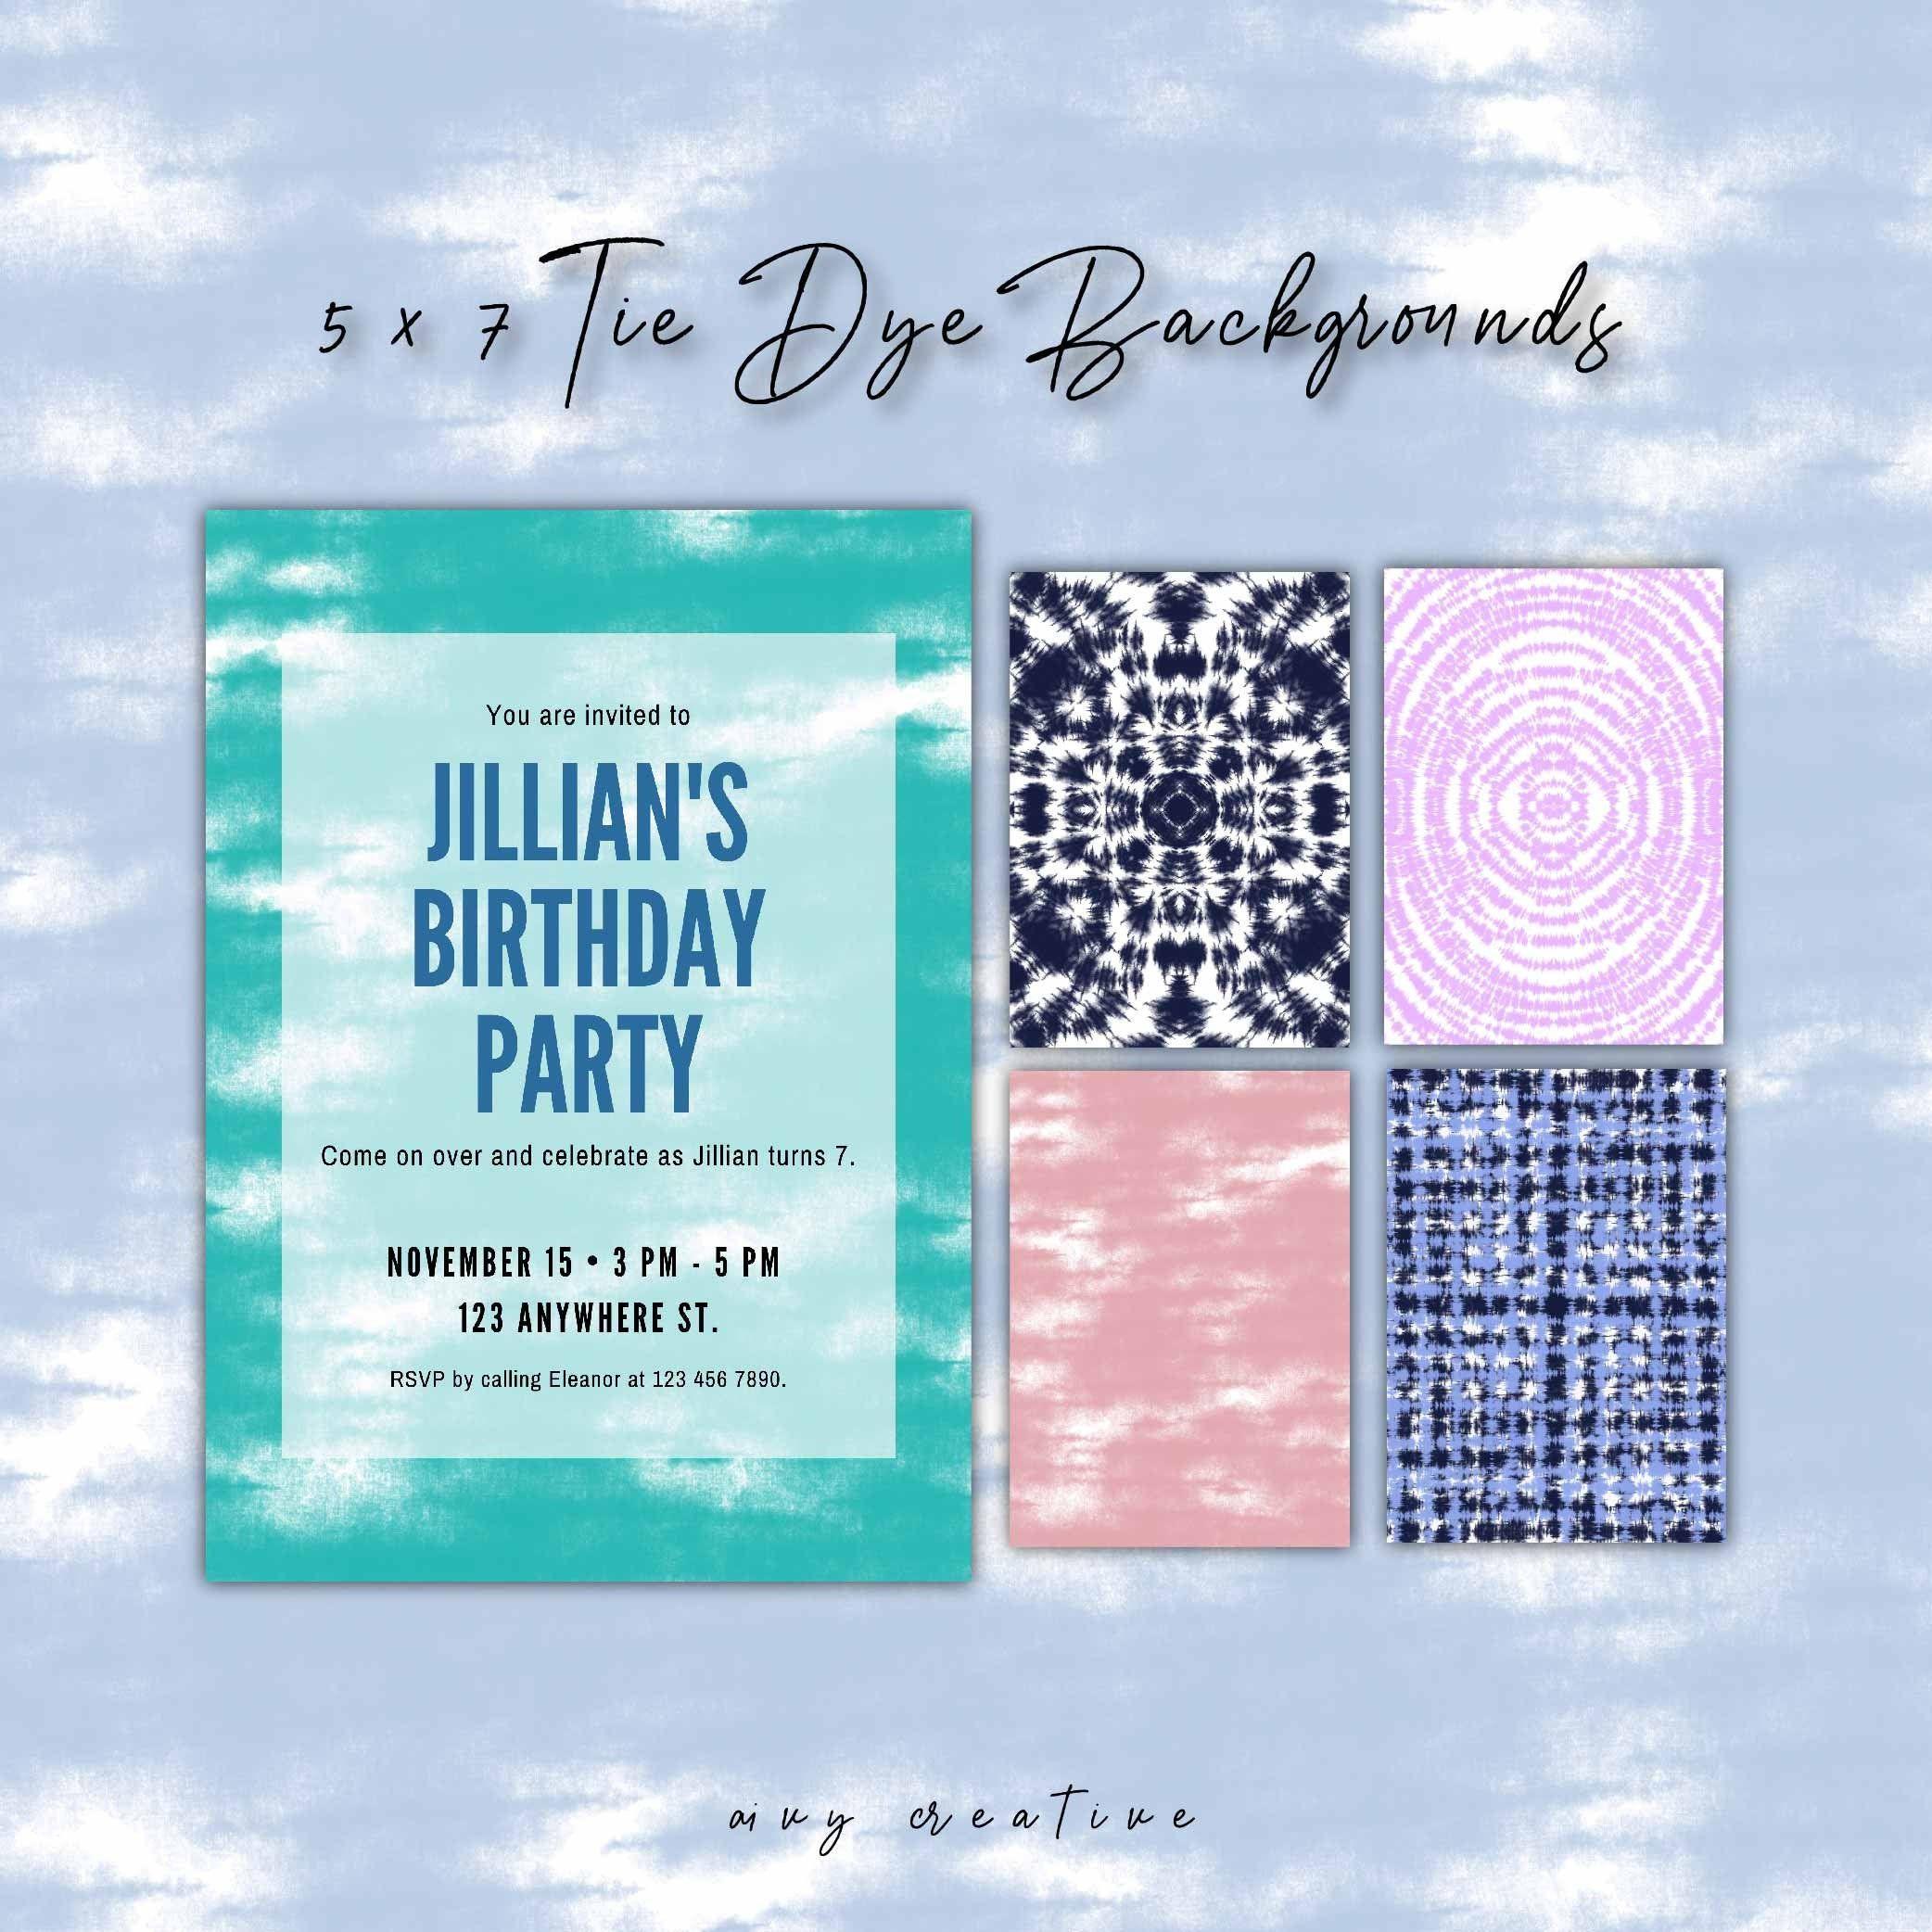 14 Colorful 5 X 7 Tie Dye Digital Background In Jpeg Files Invitation Birthday Marketing Social Media Commercial Use In 2020 Birthday Invitations Invitations Wedding Card Templates